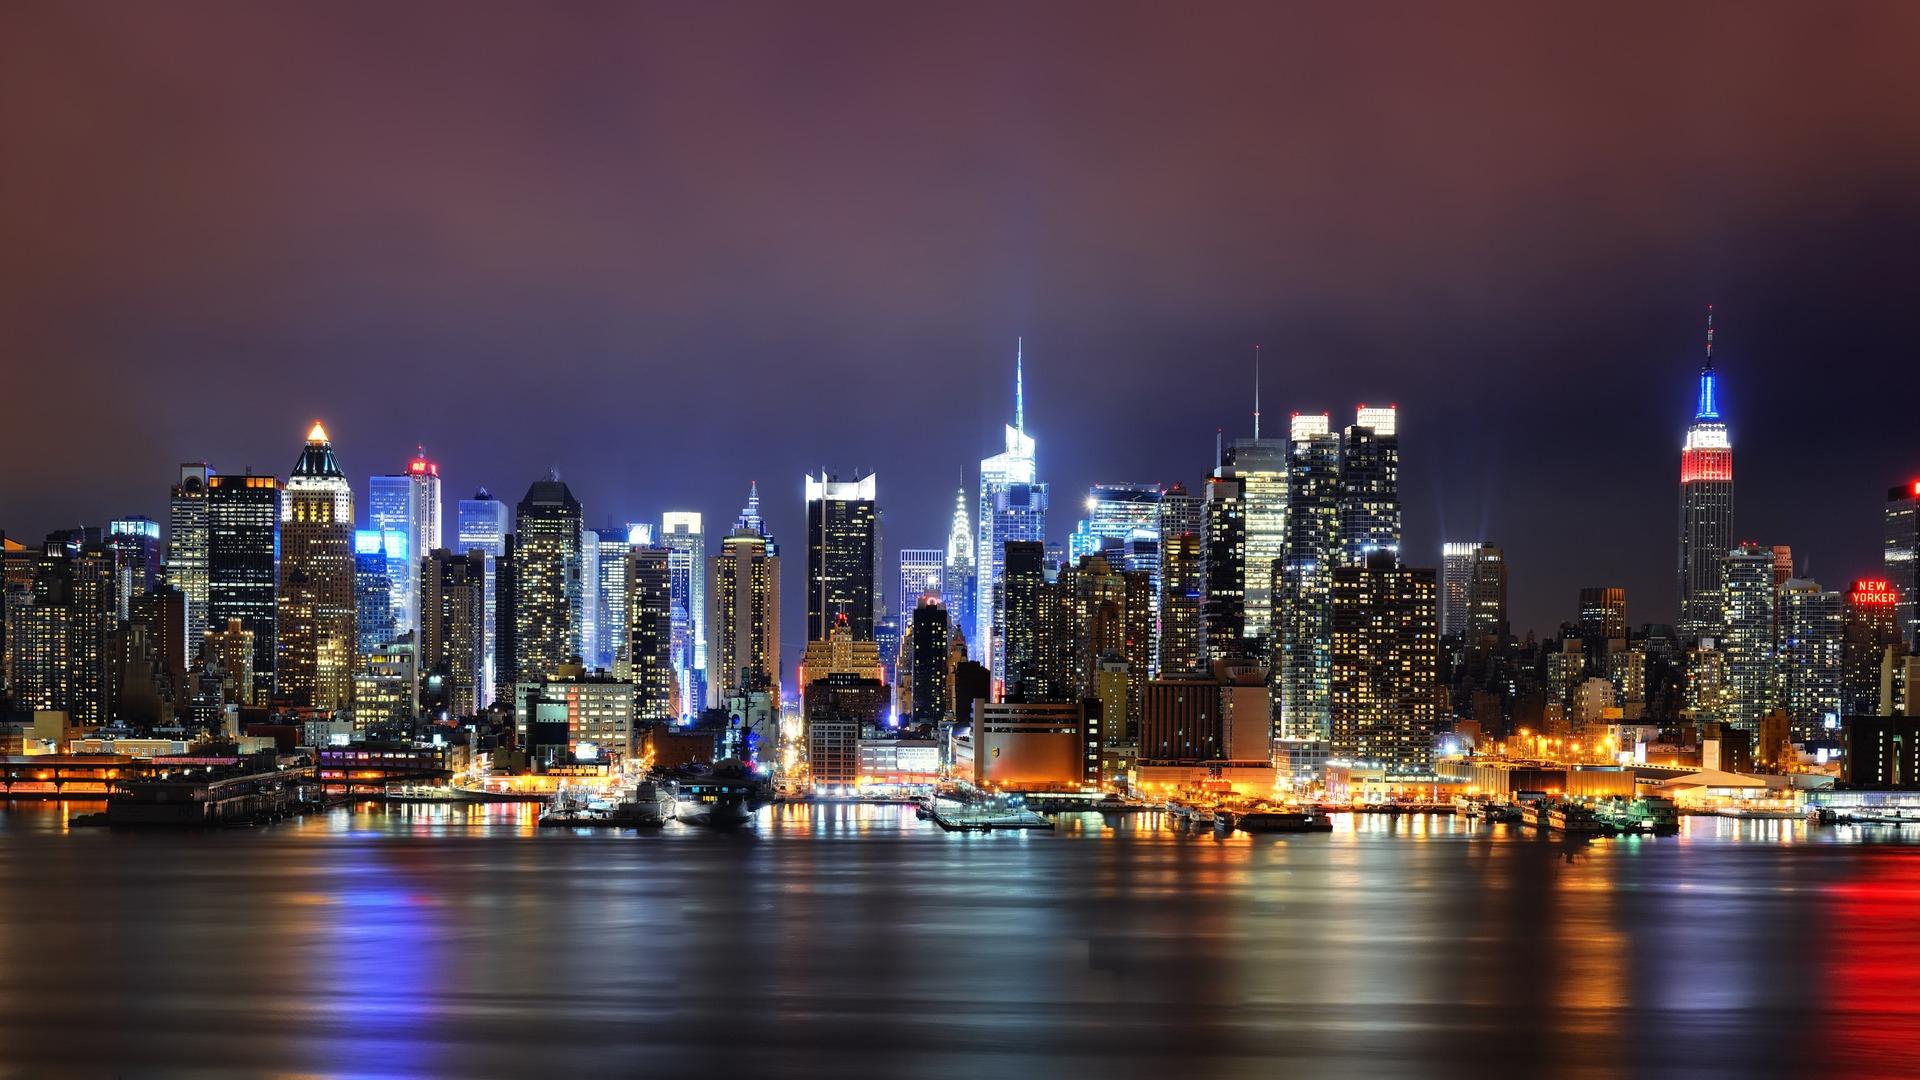 City Landscape New York Wallpaper Windows 1920x1080